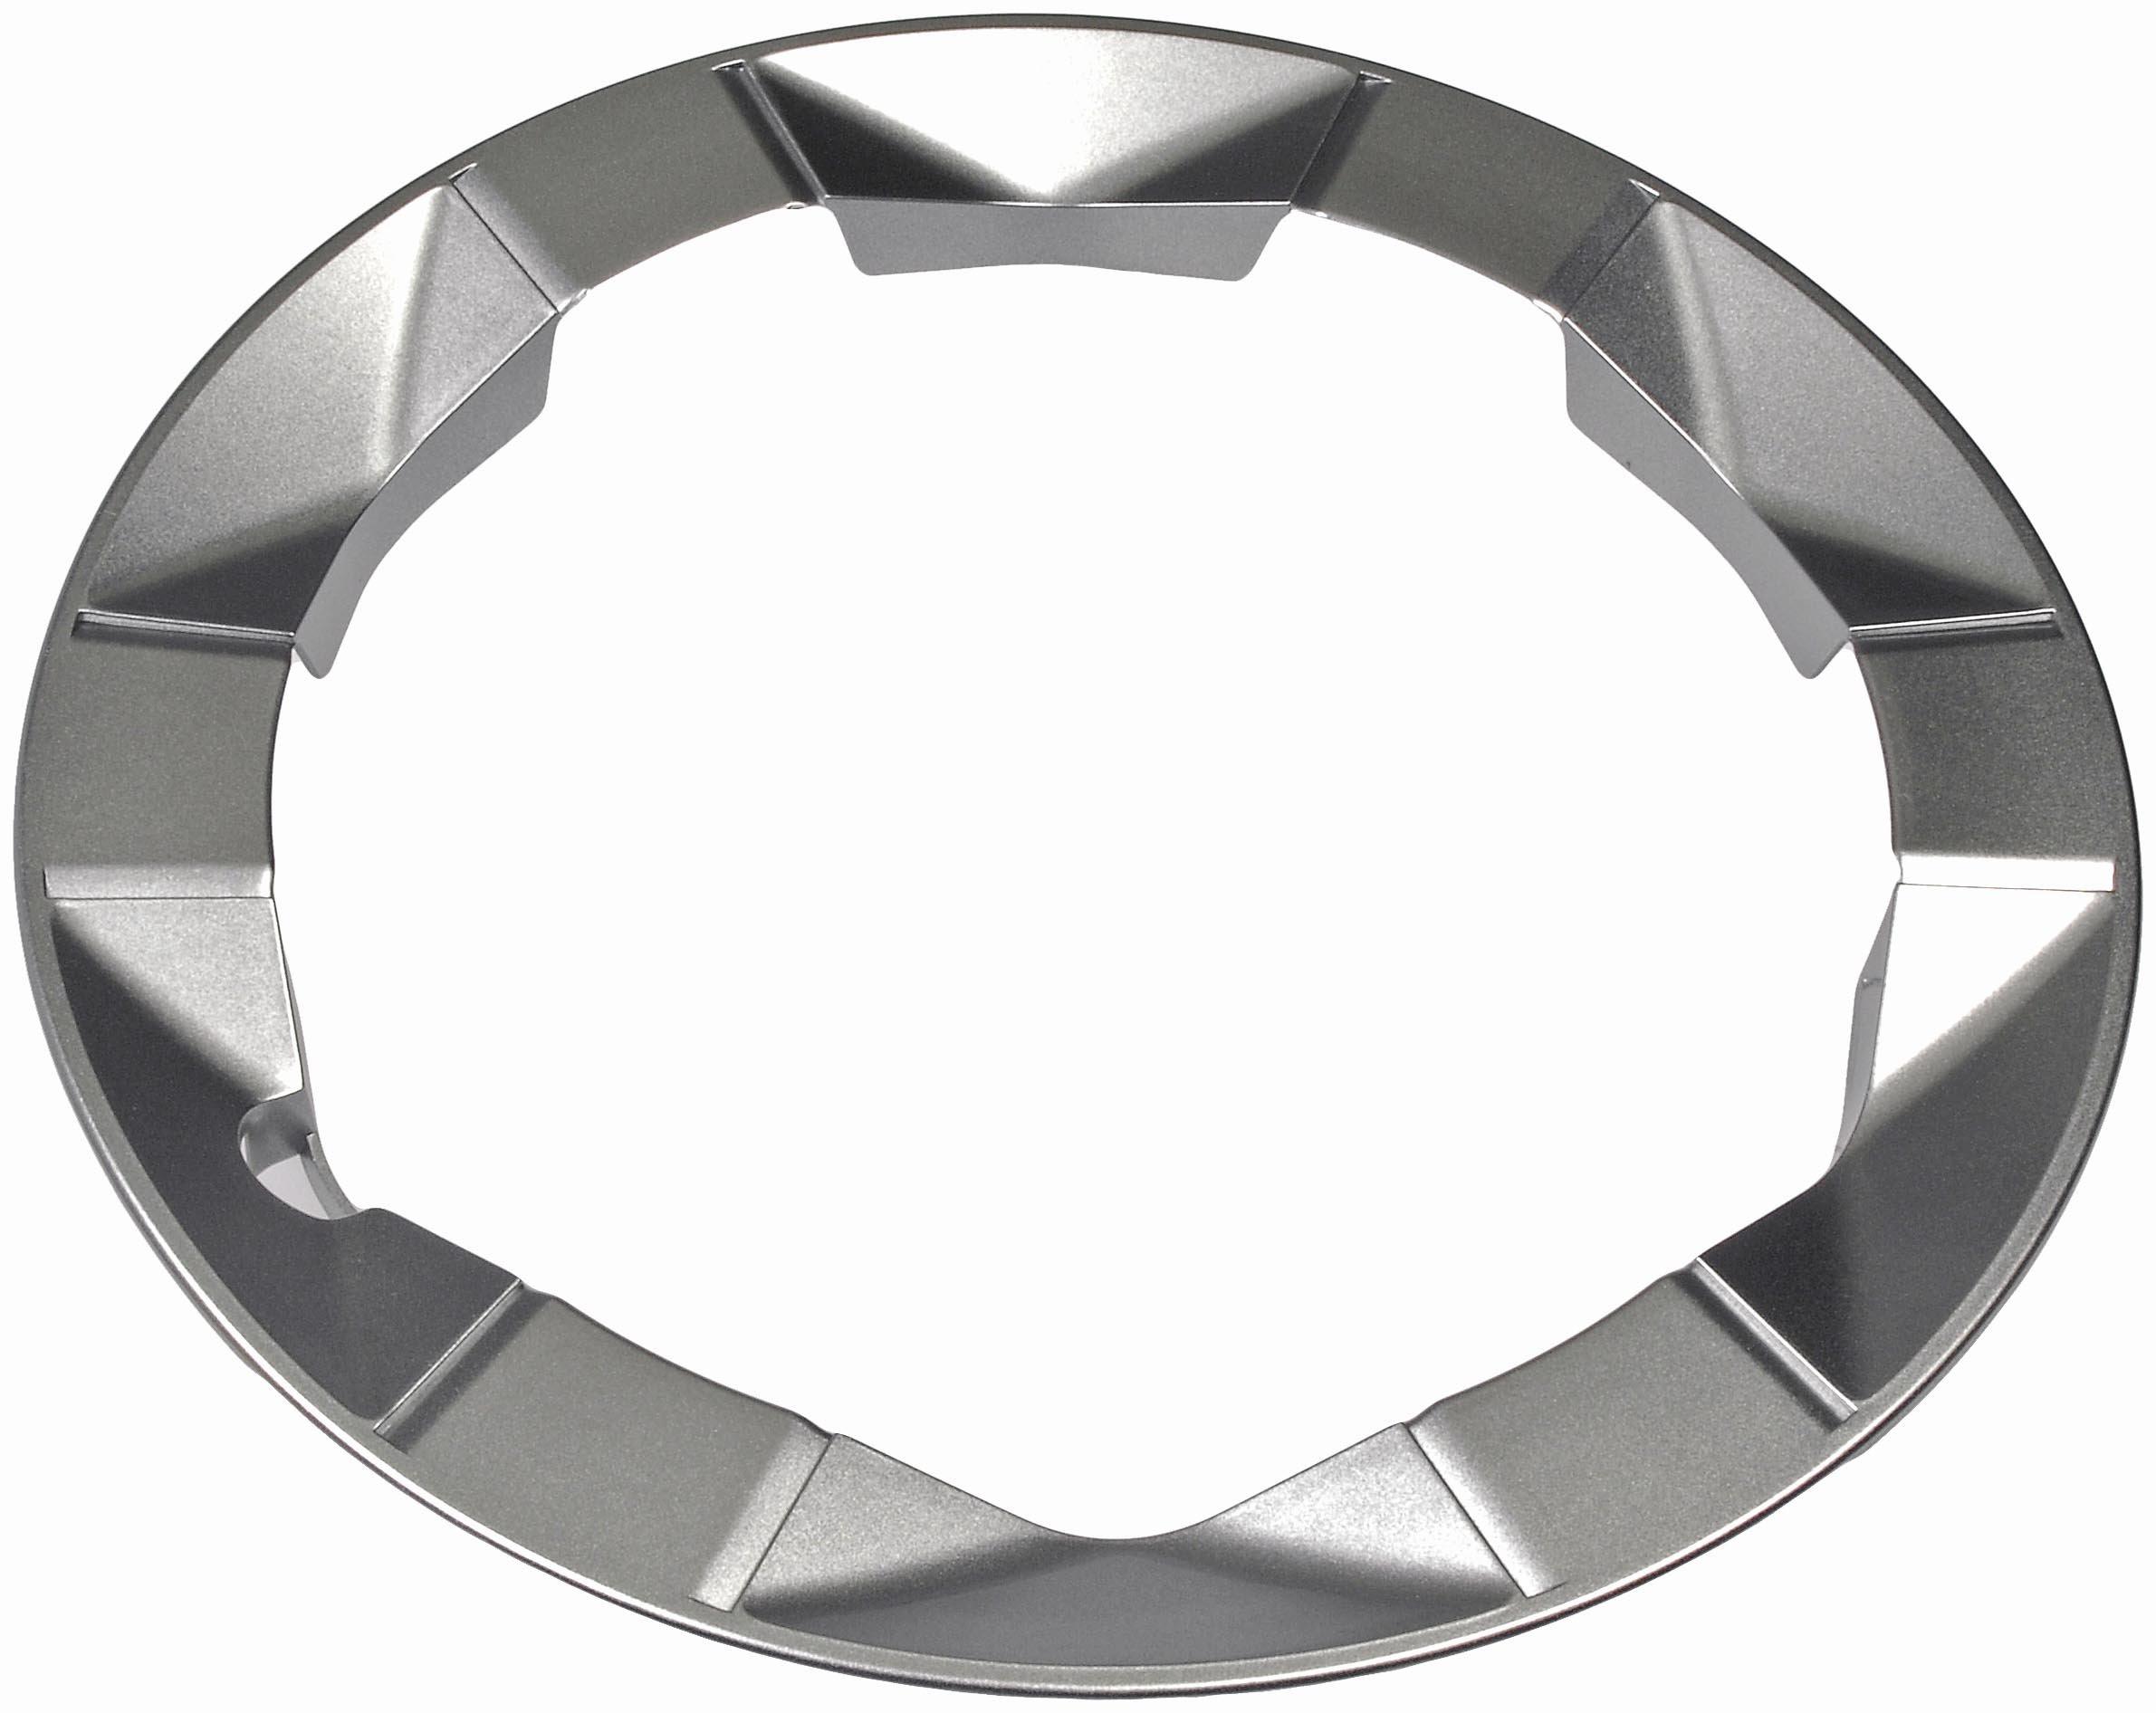 DORMAN 909-900 Wheel Trim Ring